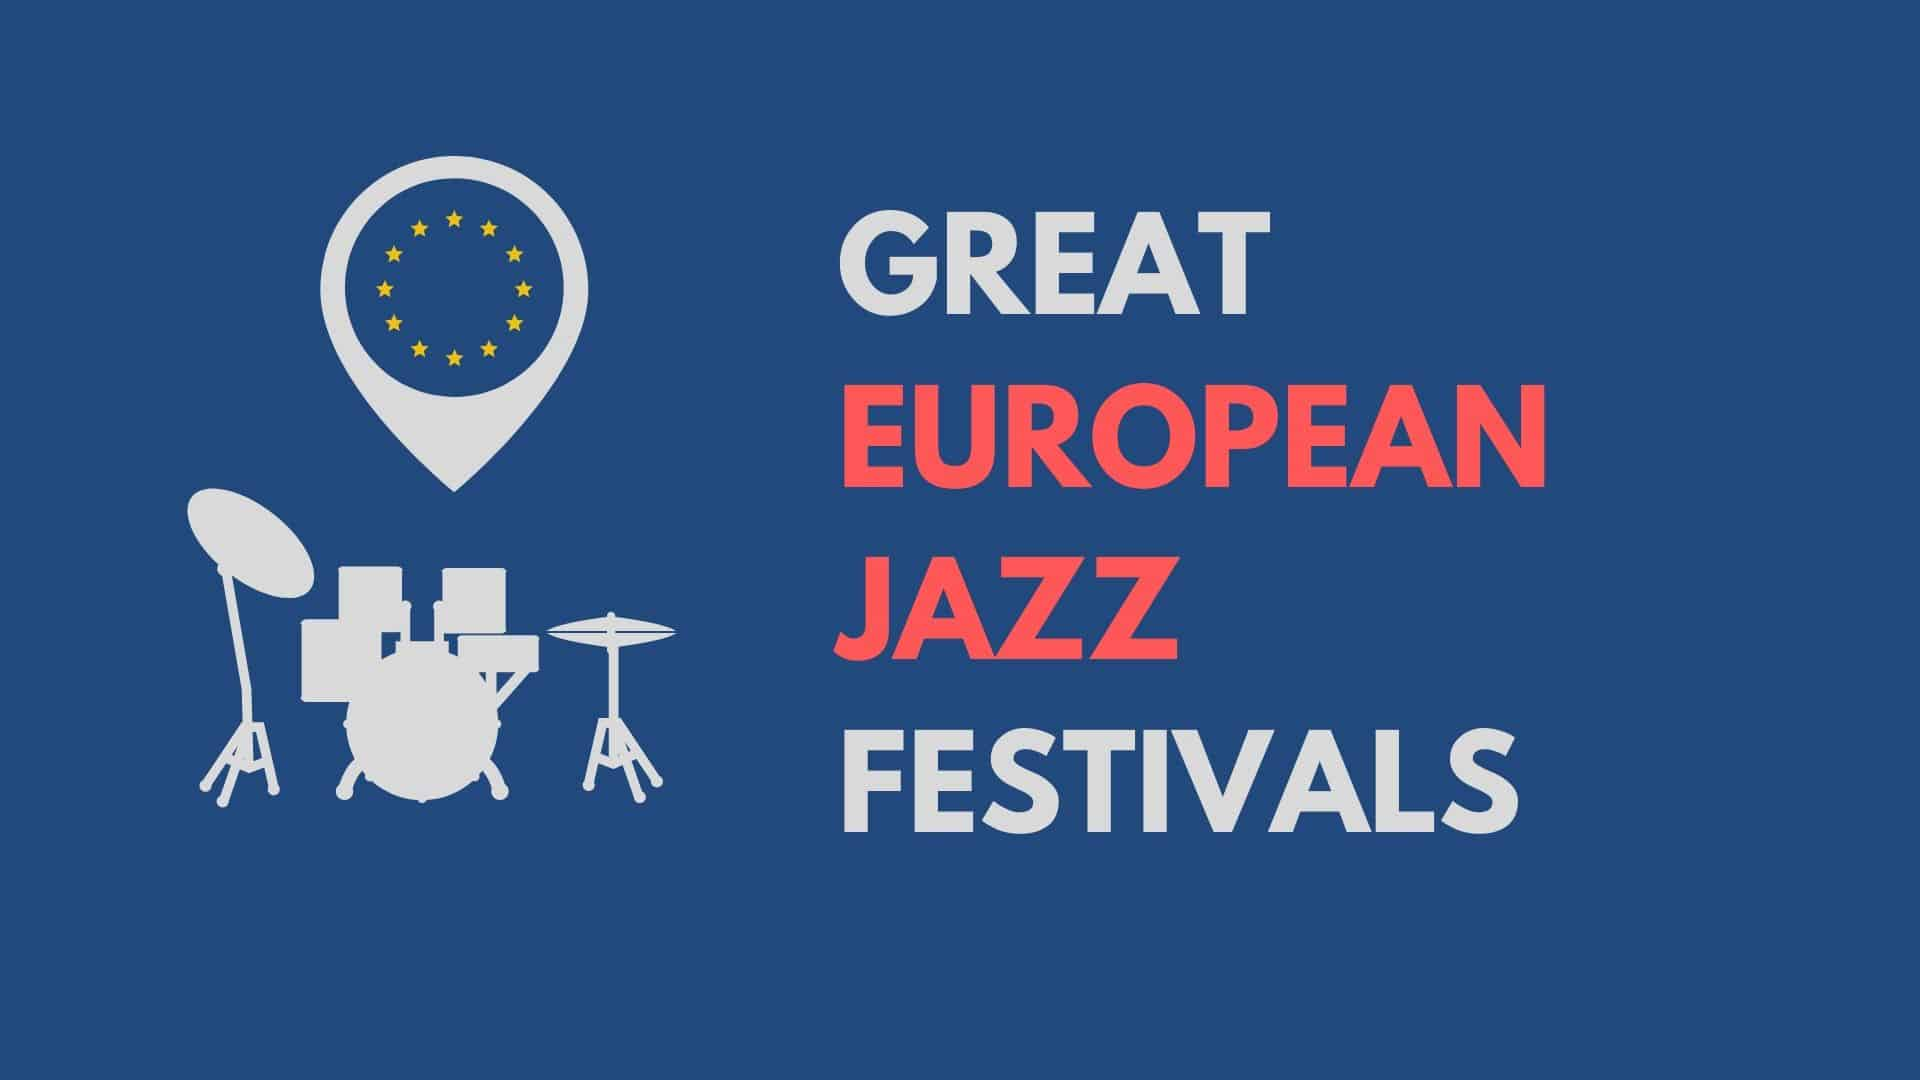 European jazz festivals